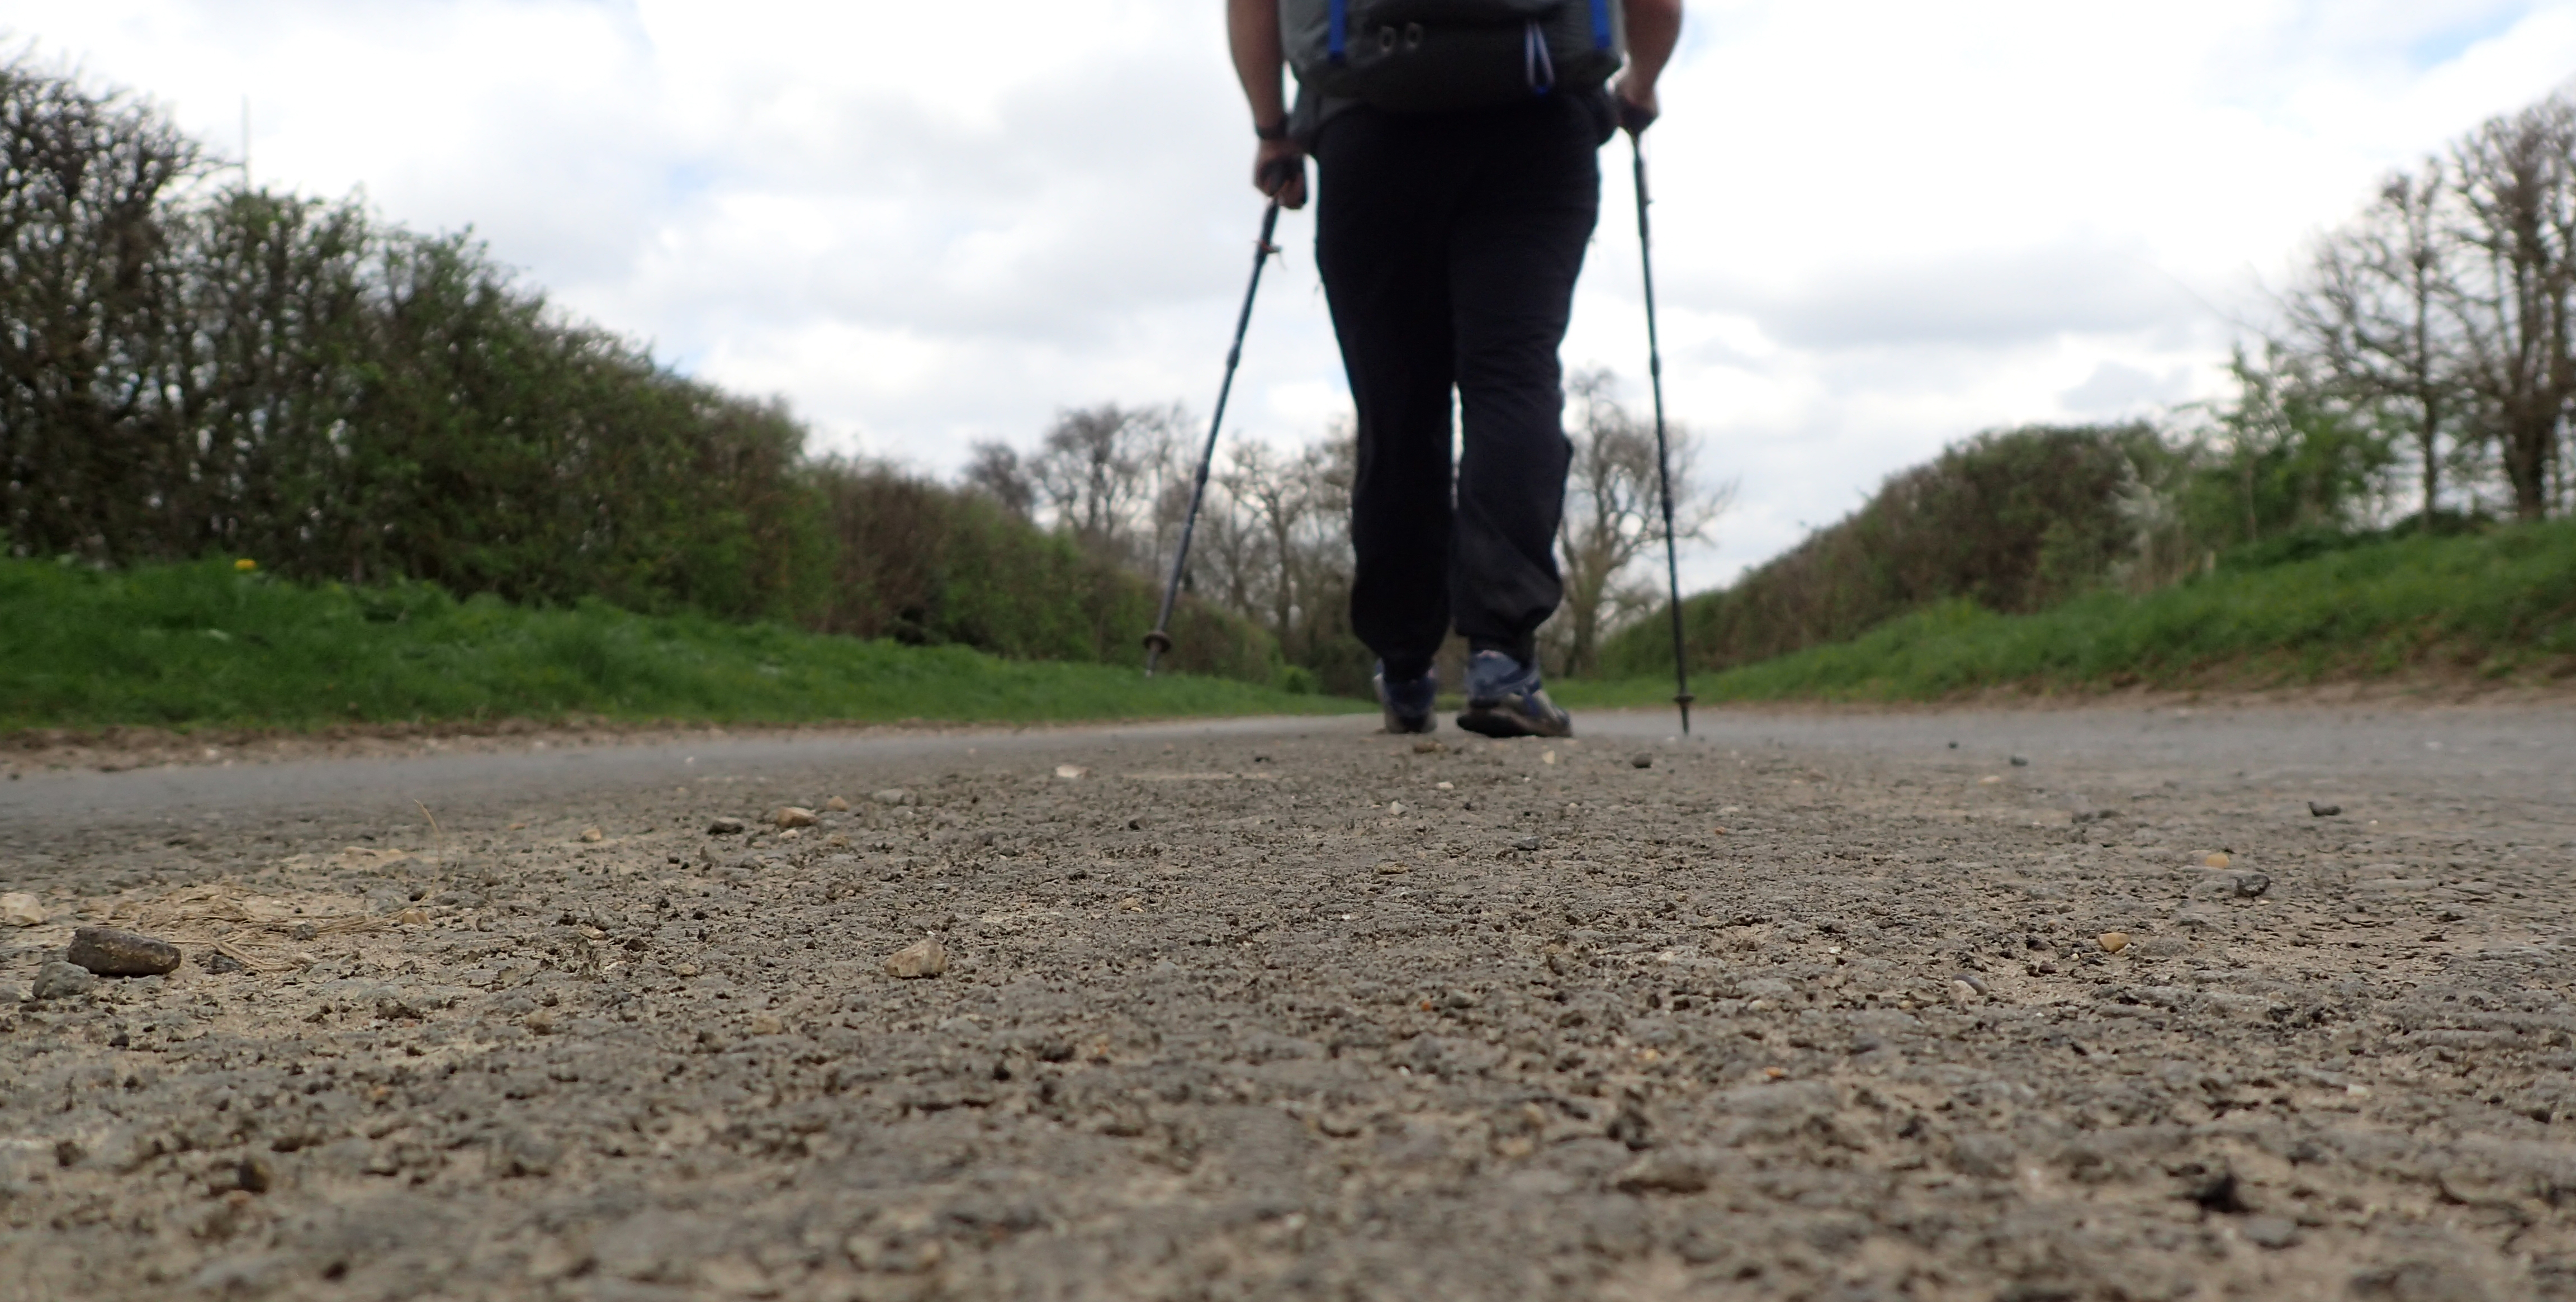 Walking the Peddars Way